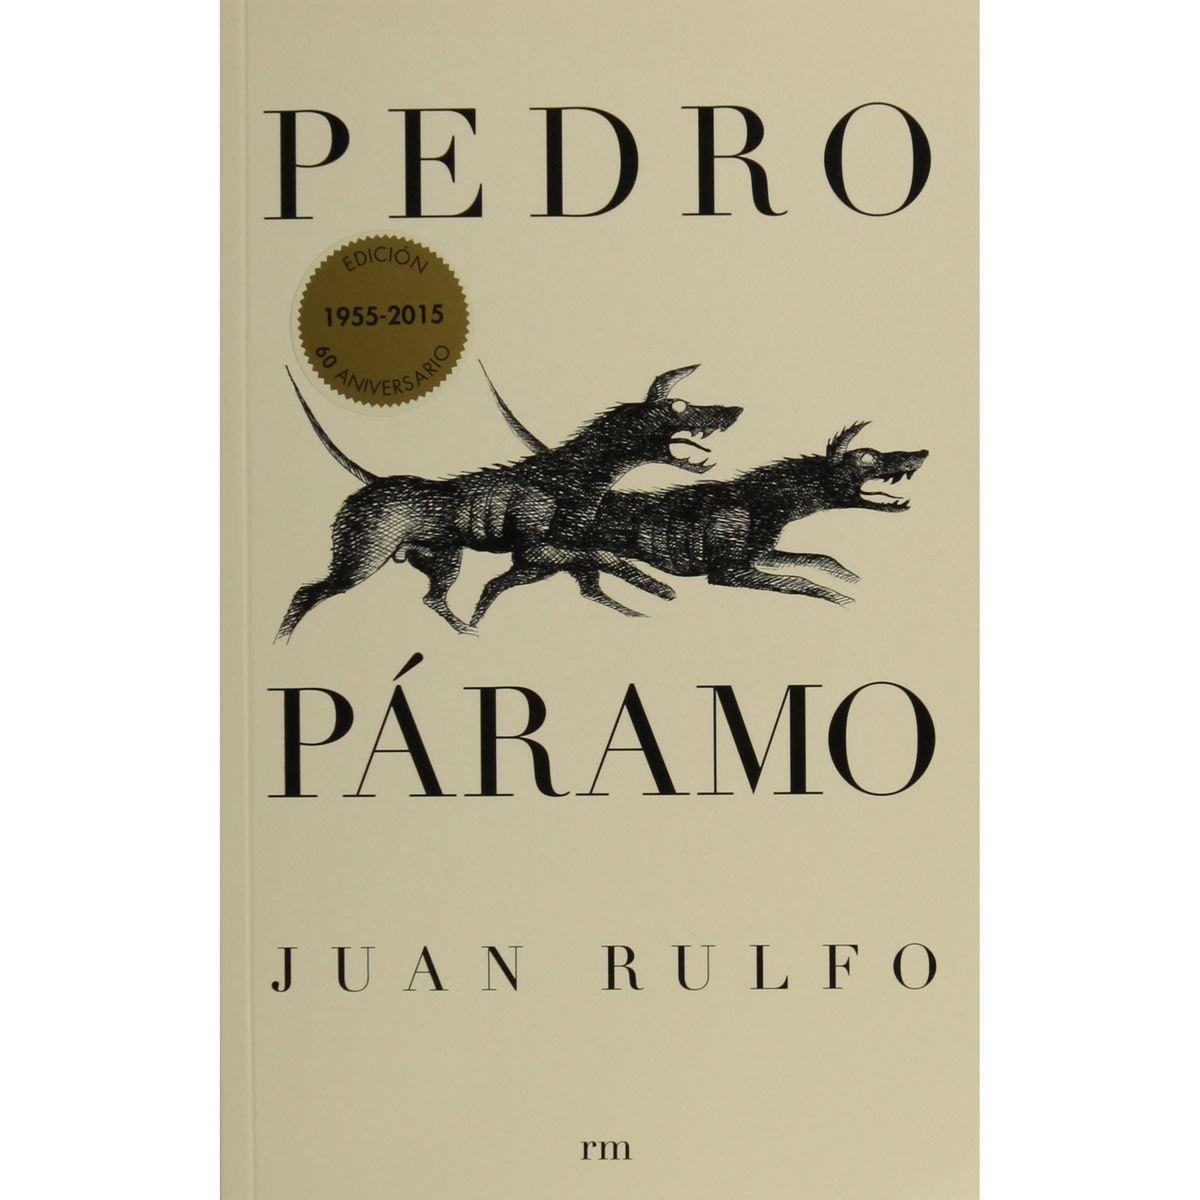 Pedro paramo